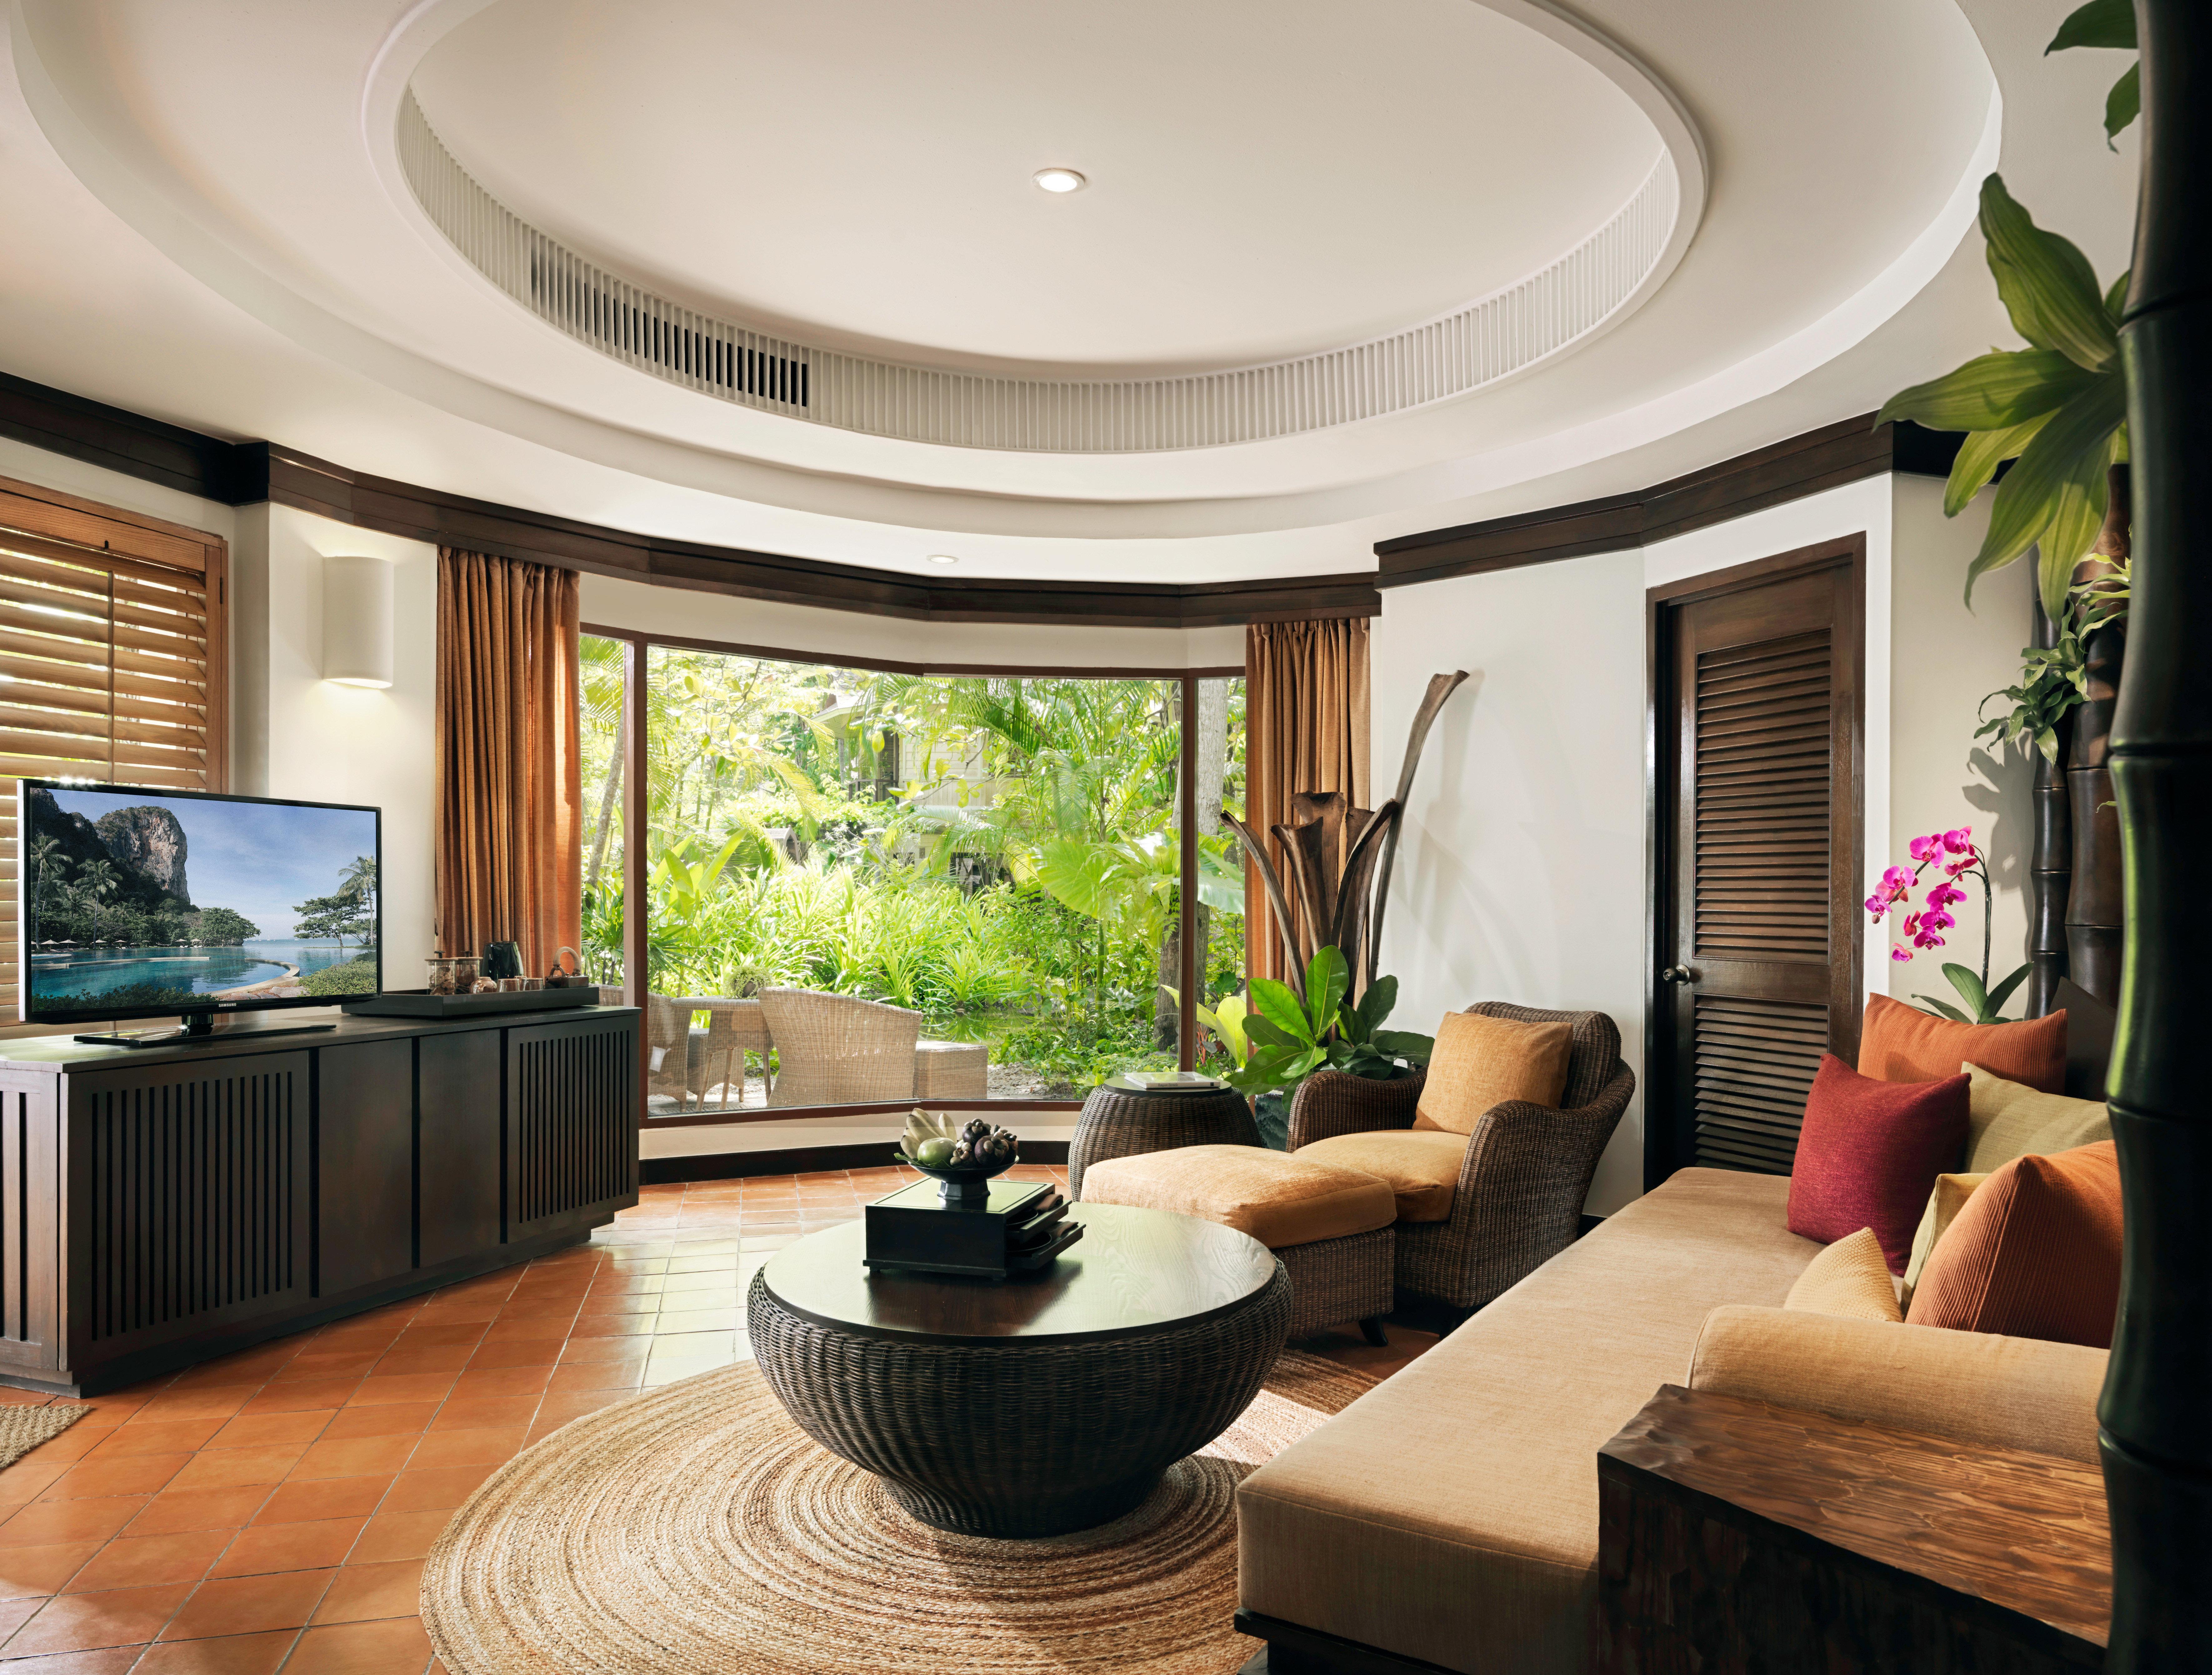 Lounge Scenic views living room property home condominium Suite lighting mansion flat